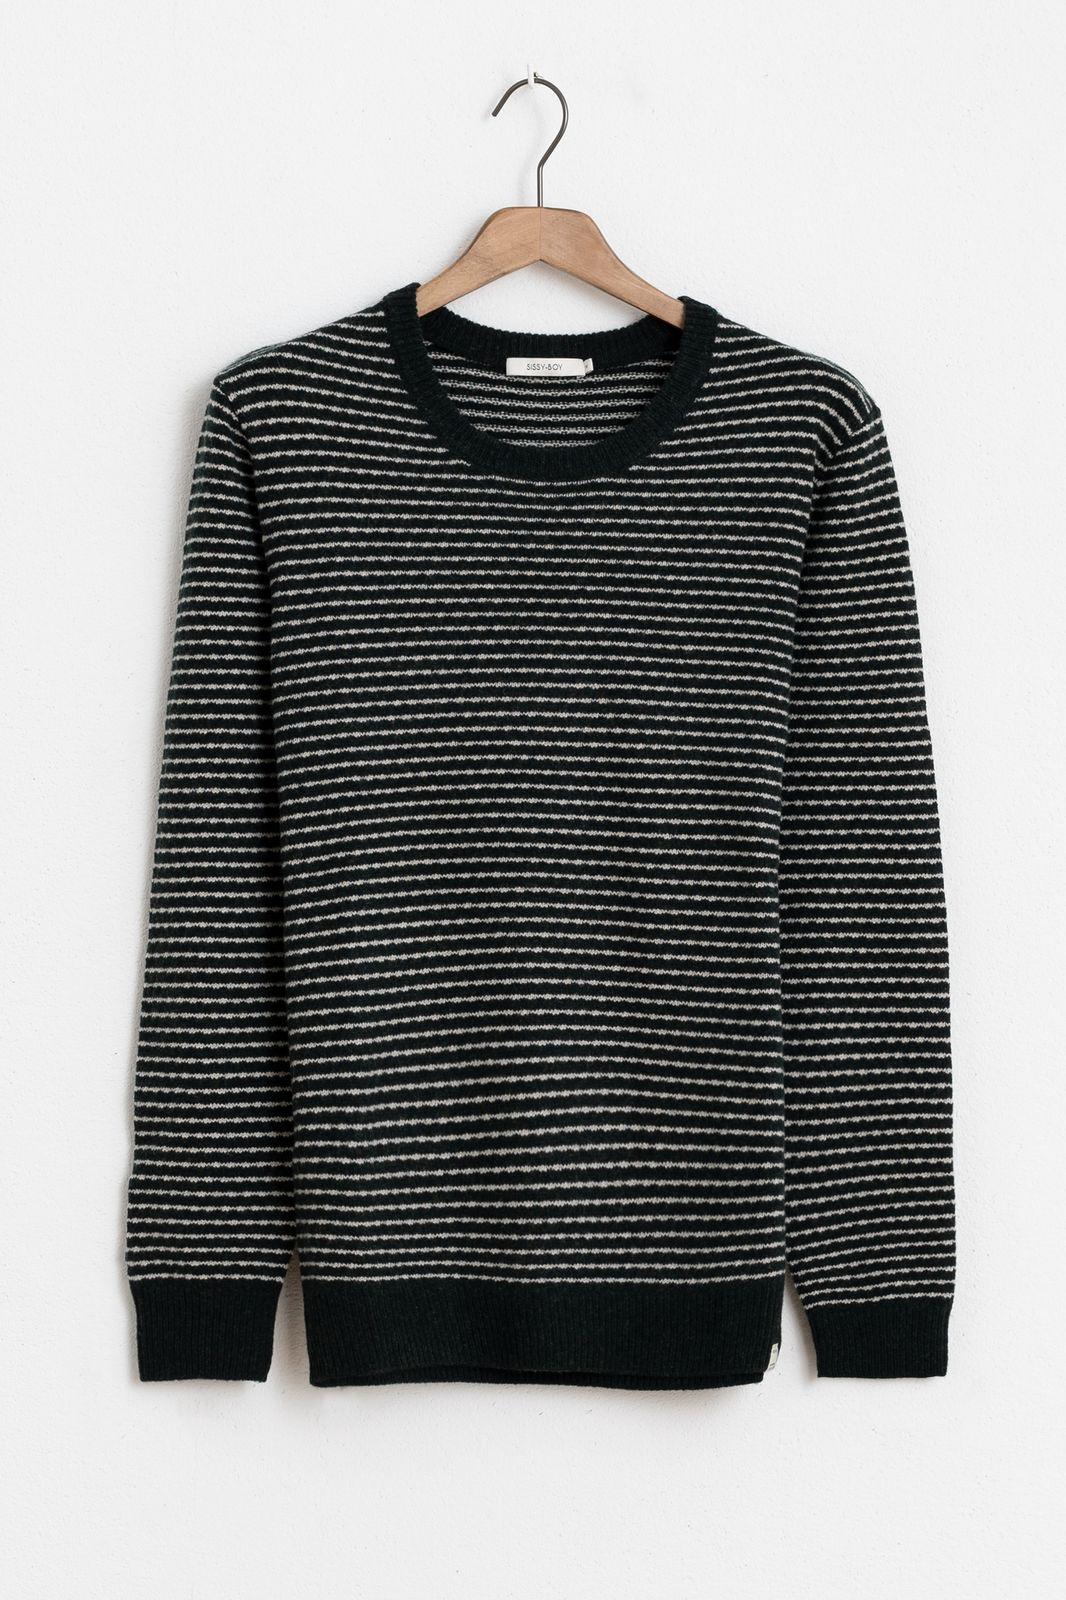 Donkergroen/witte trui gestreept - Heren | Sissy-Boy